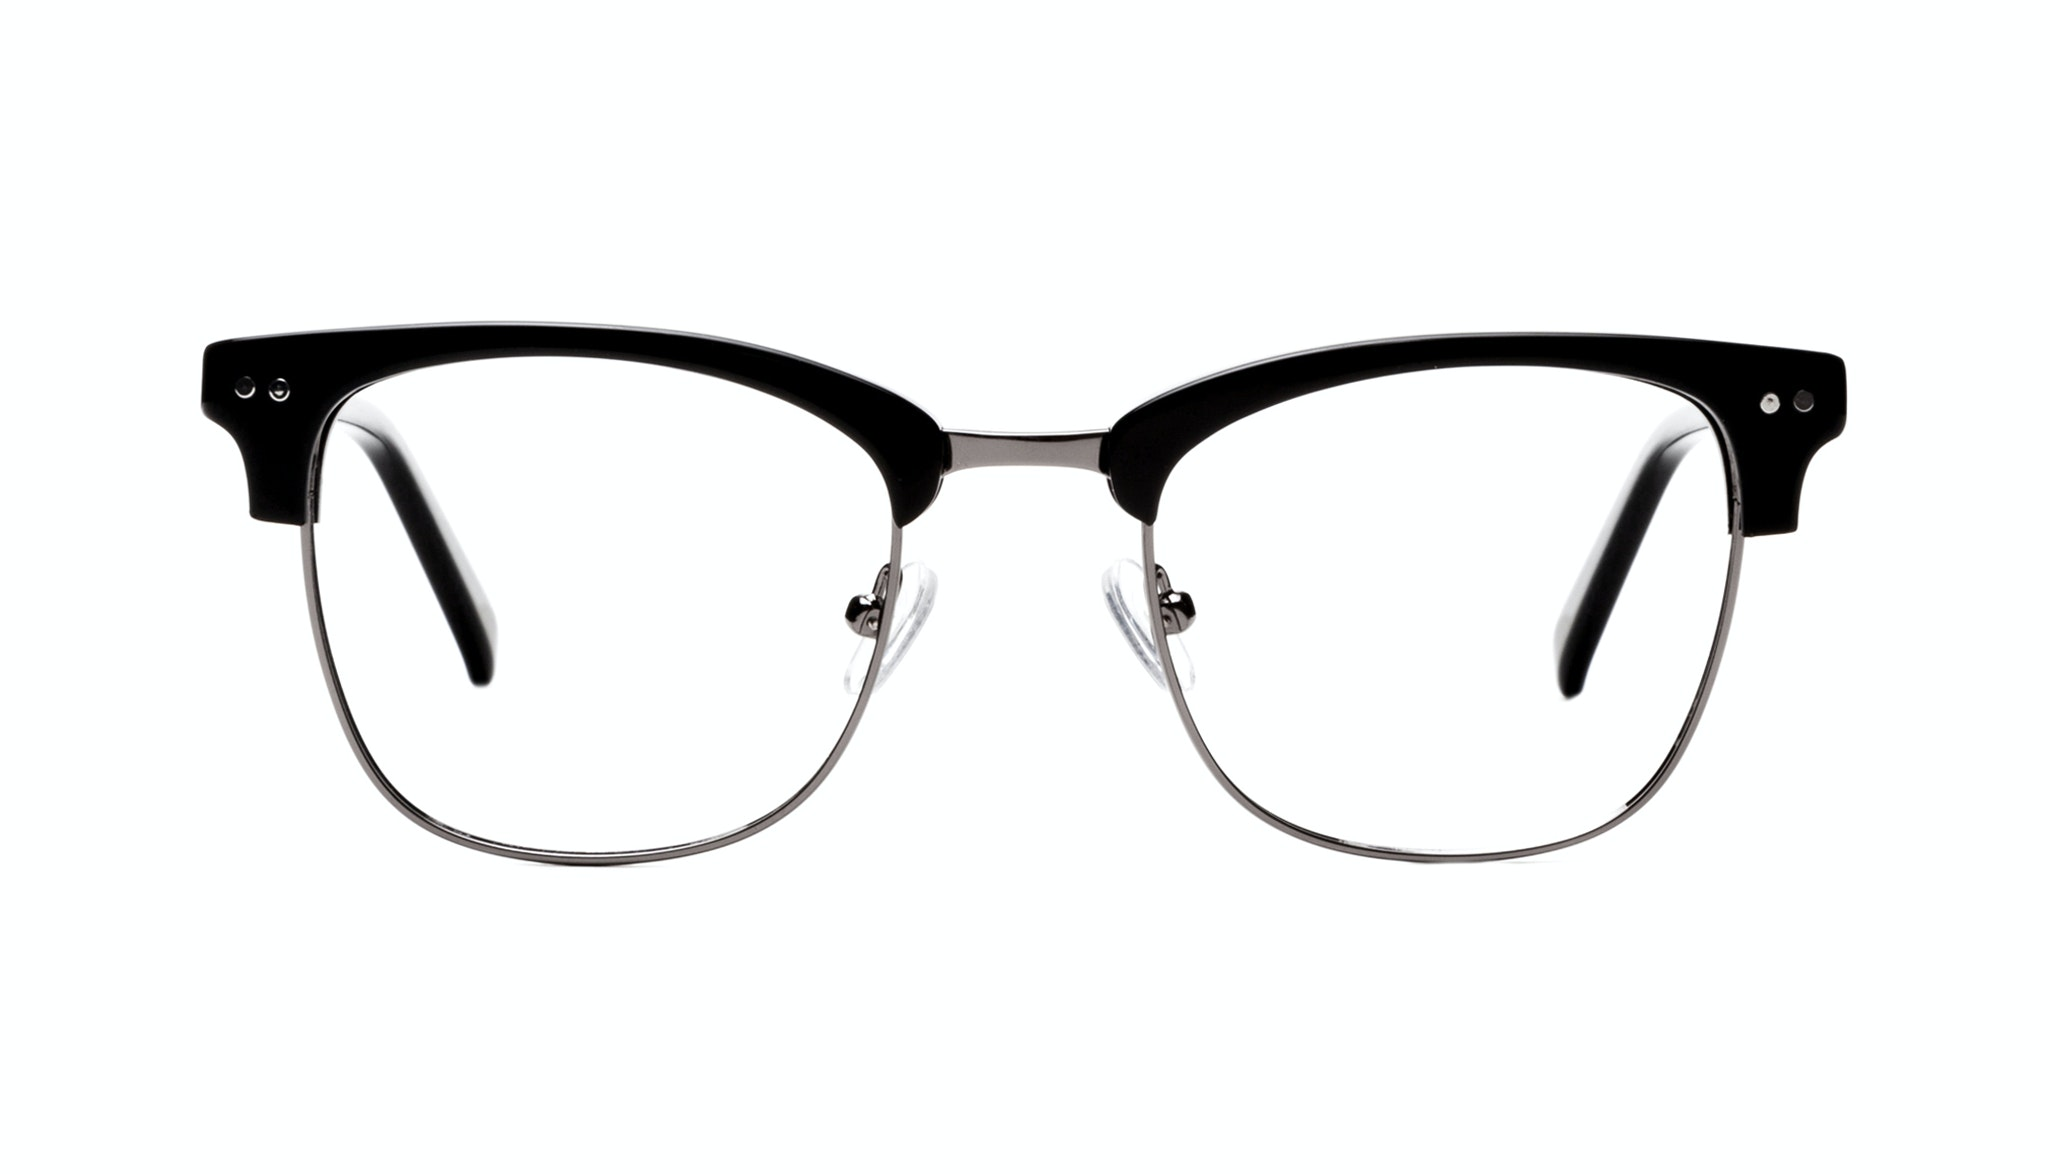 Affordable Fashion Glasses Square Eyeglasses Men Lift Onyx